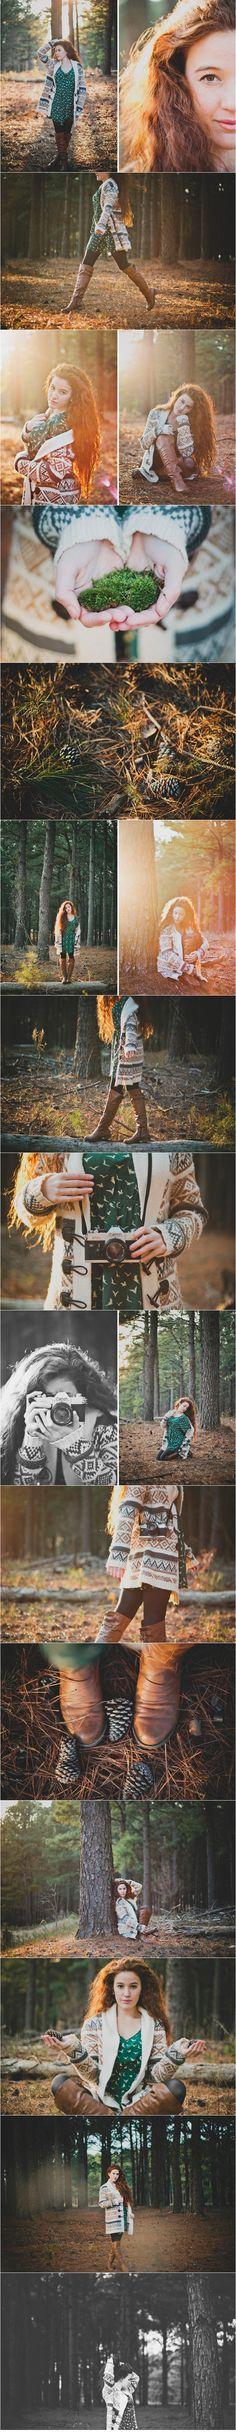 Featured Photographer | Evoking You #photogpinspiration